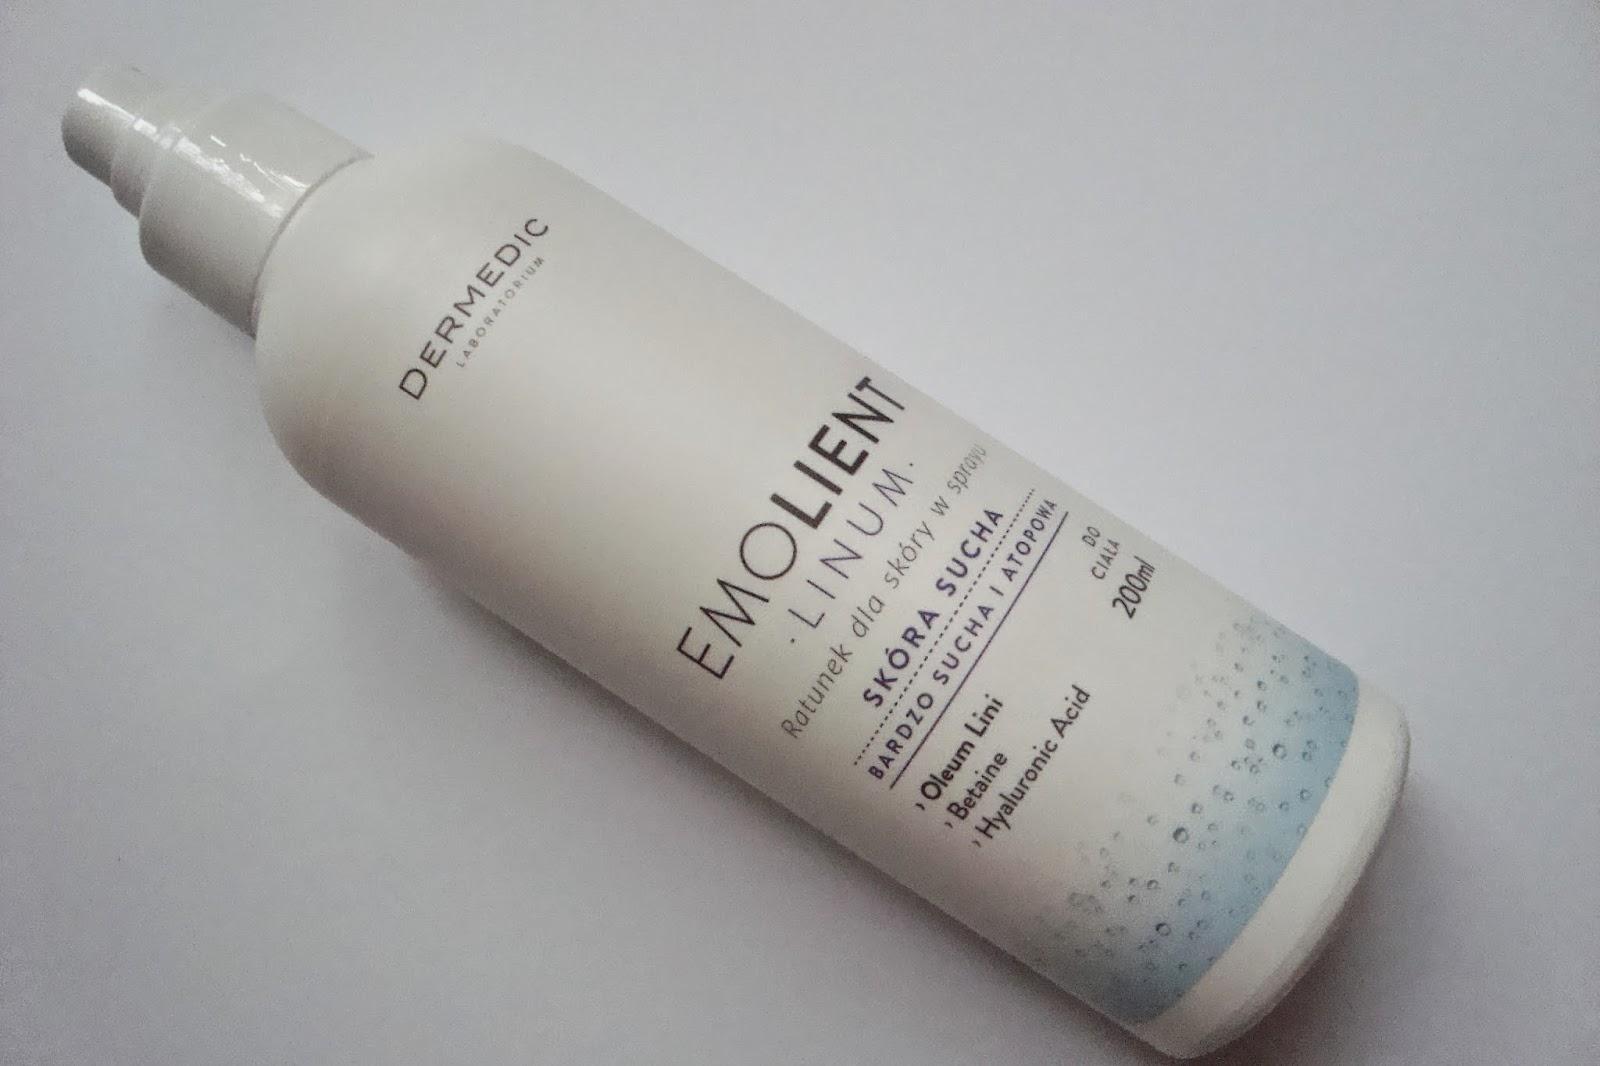 Ratunek dla skóry w sprayu Dermedic Emolient linum